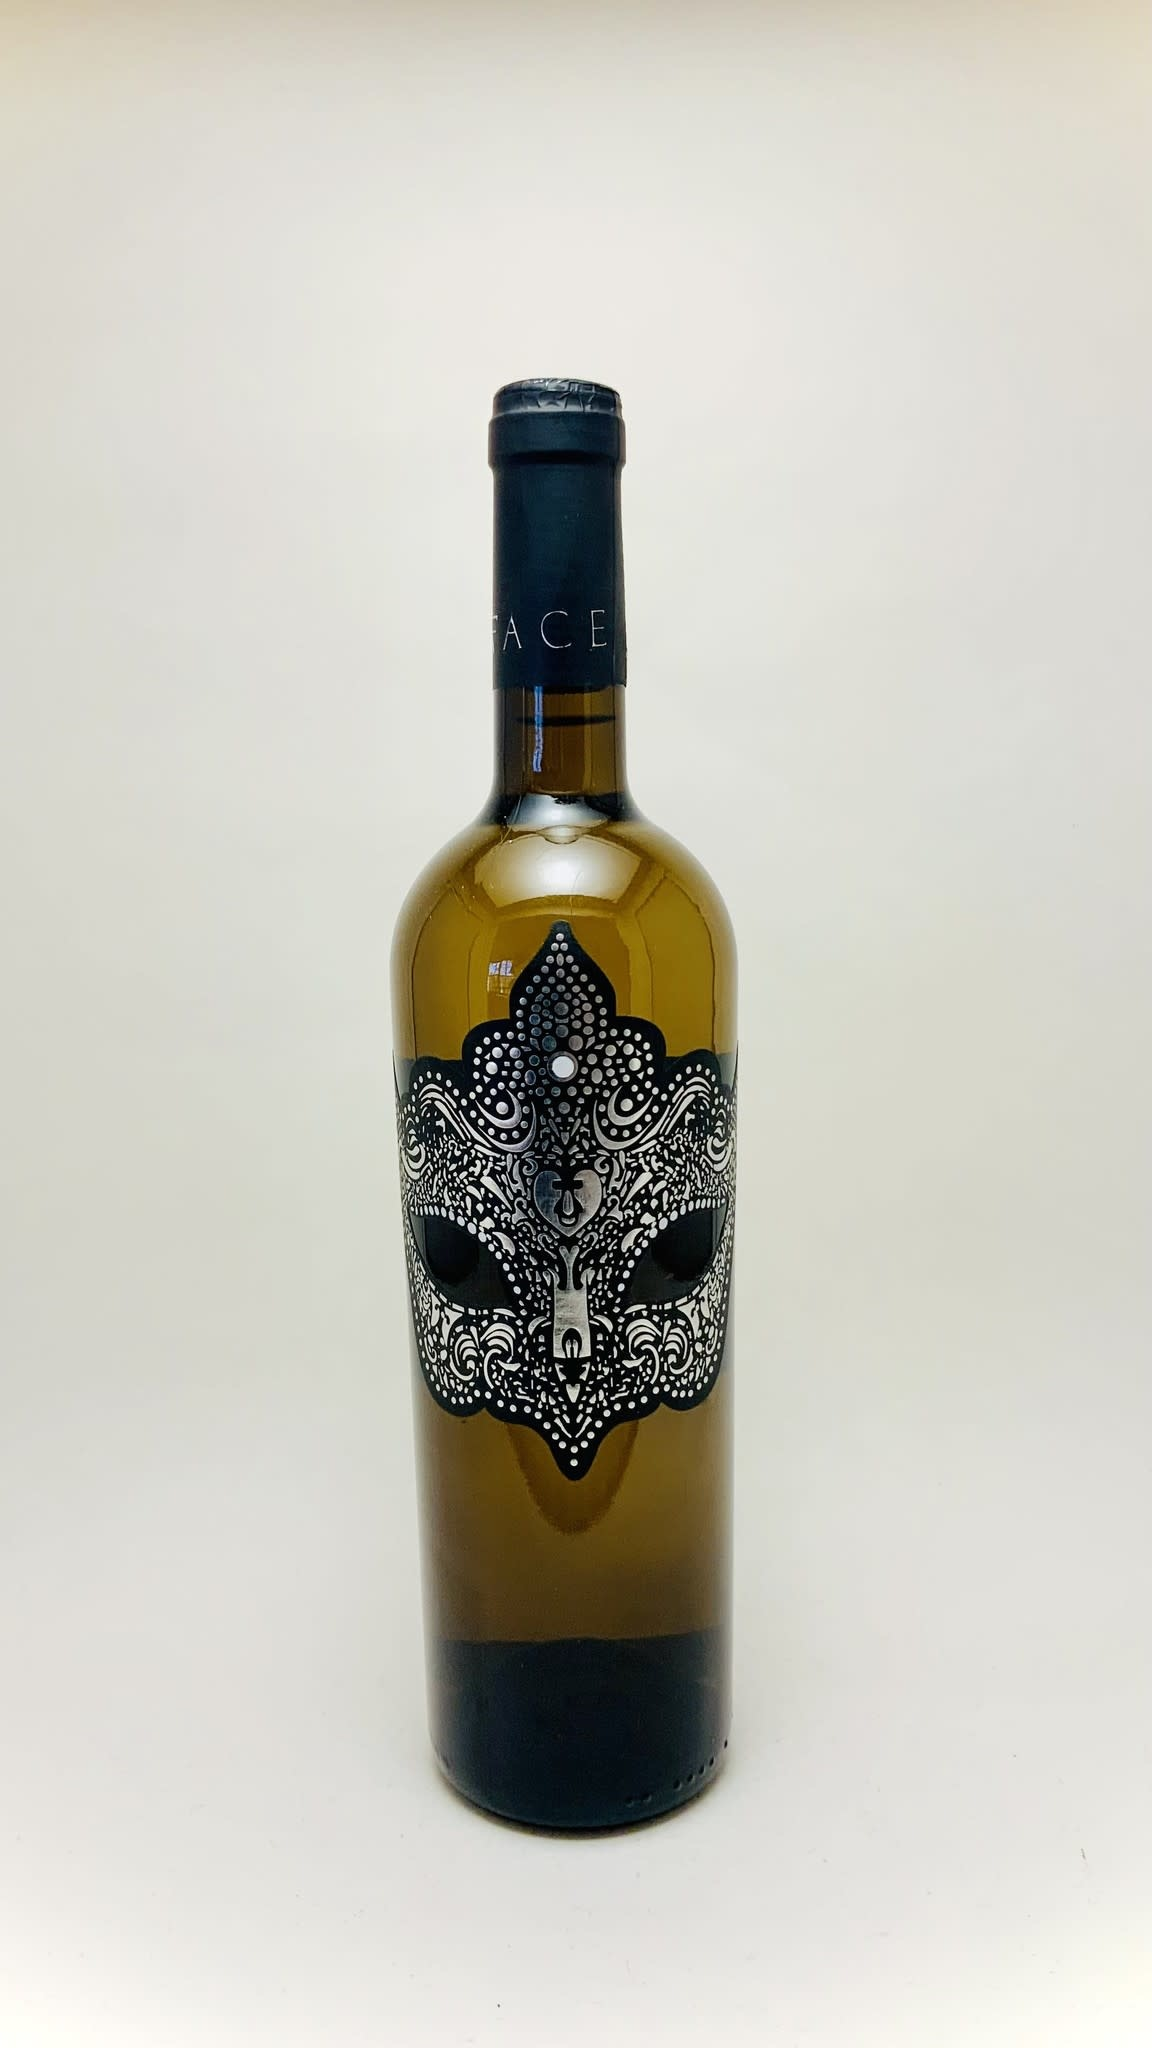 Volteface Vinho Branco Private Selection Alentejo Portgual 2018